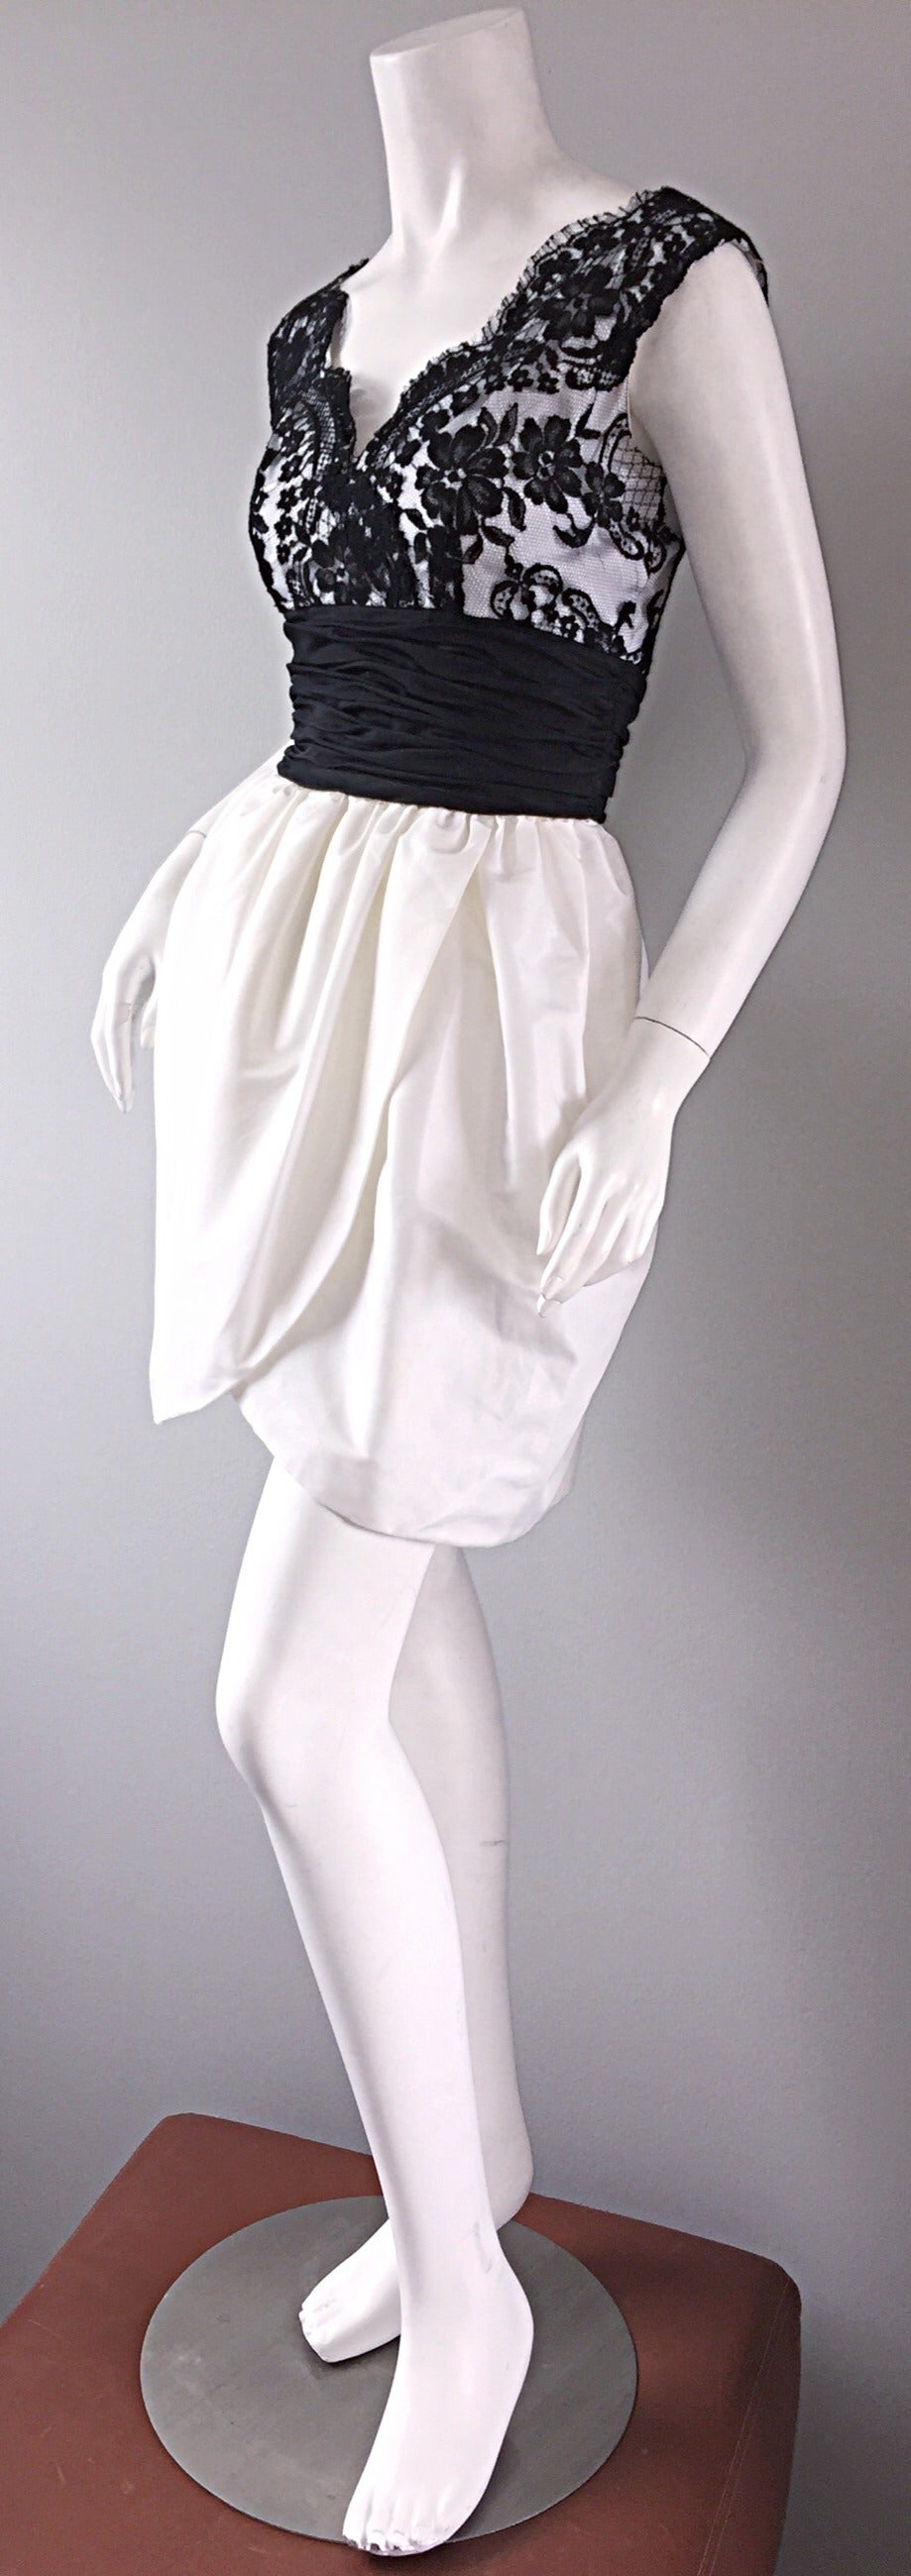 Vintage Victor Costa Black + White Silk Taffeta Lace Cocktail Dress 6